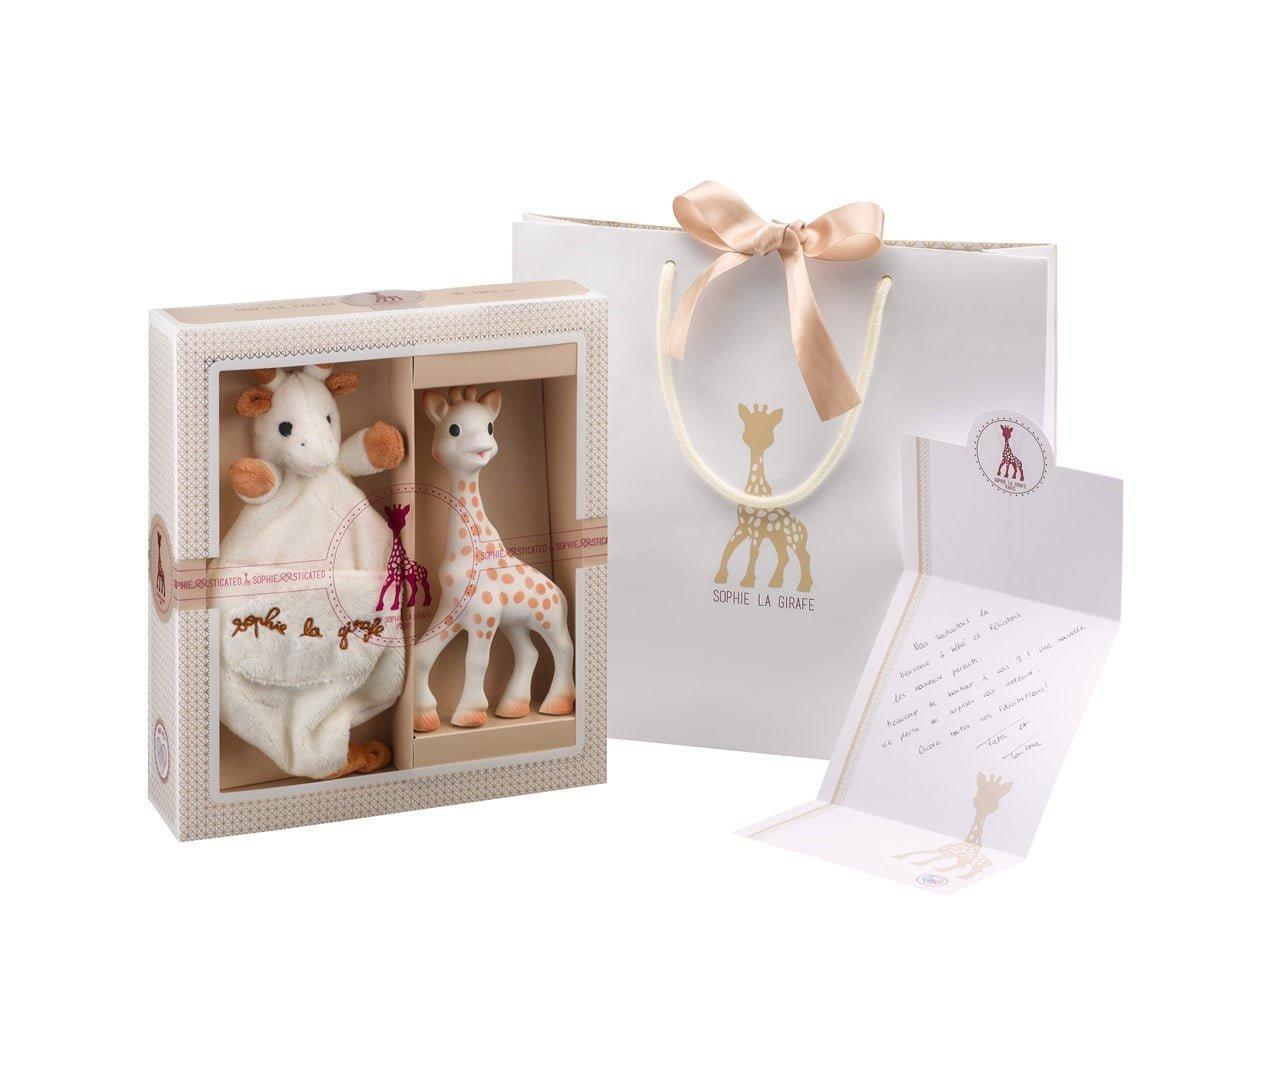 0013260-sophie-la-girafe-sophiesticated-yeni-dogan-seti-3